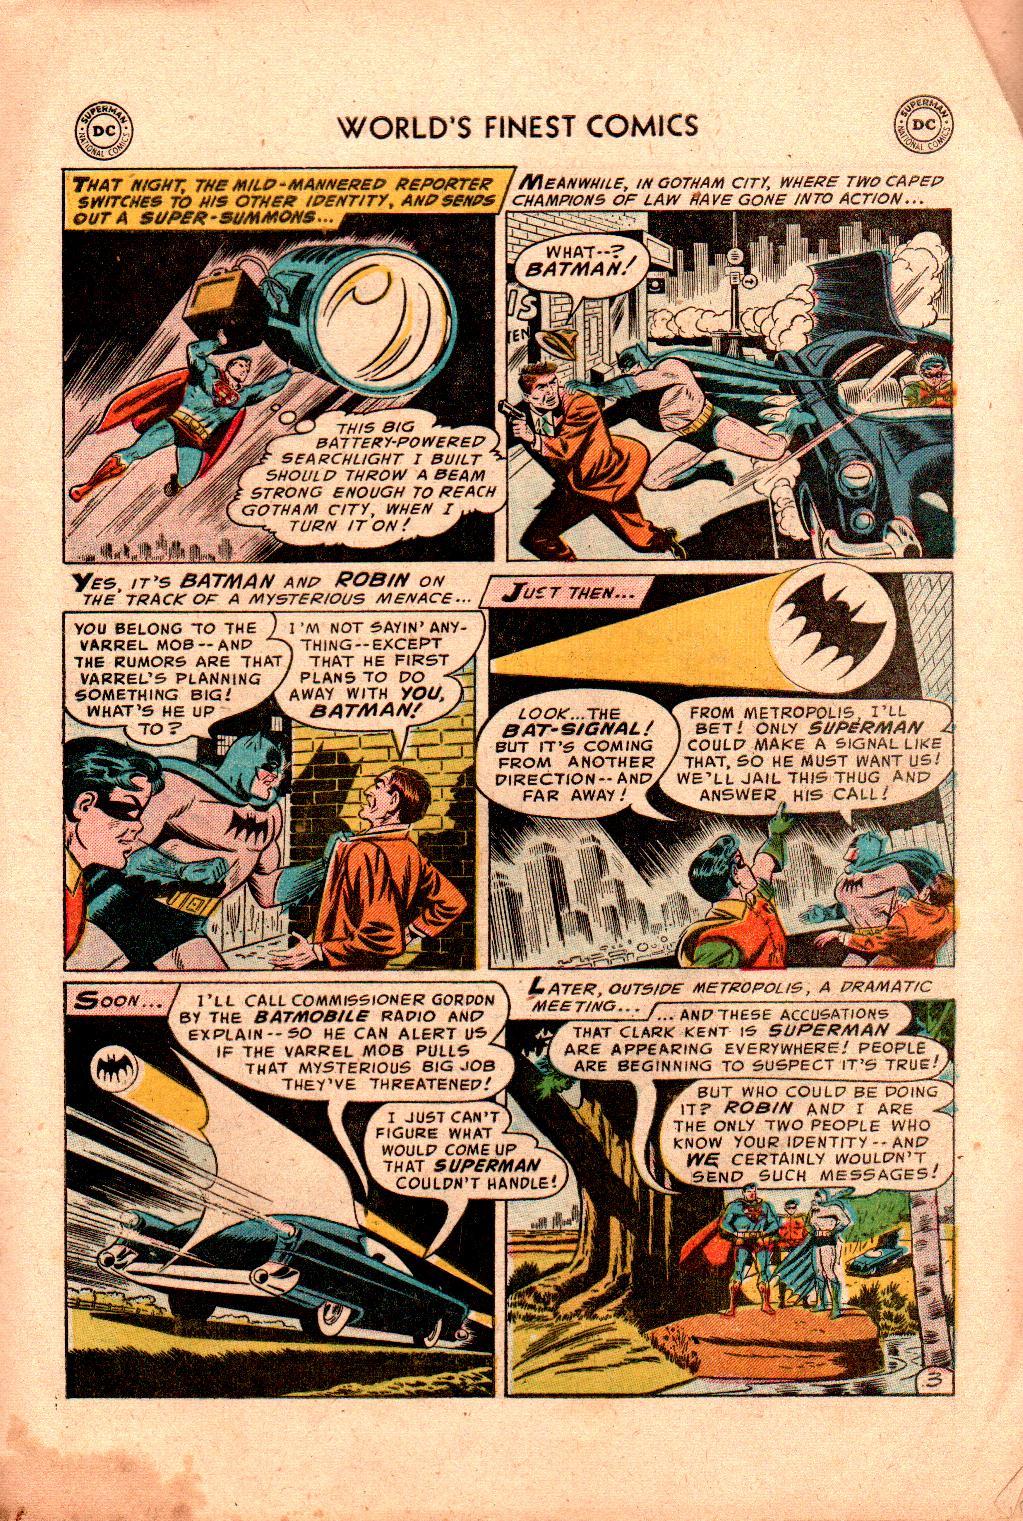 Read online World's Finest Comics comic -  Issue #78 - 5